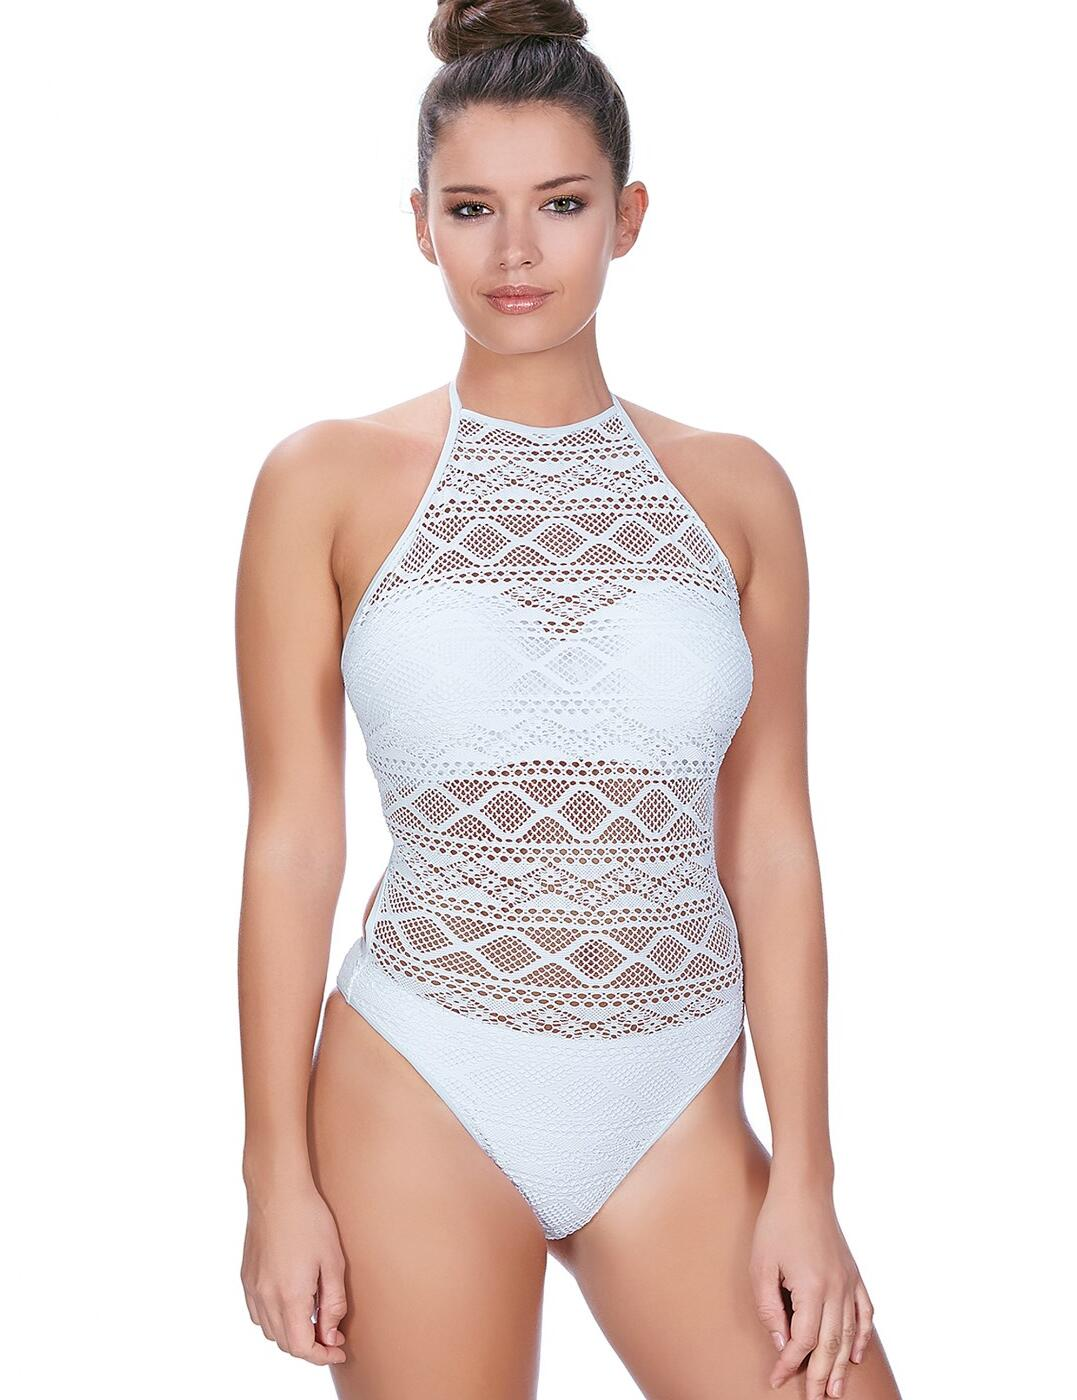 34eb316873e68 Freya Sundance As3974 W Underwired High Neck Swimsuit White (whe) 36 ...